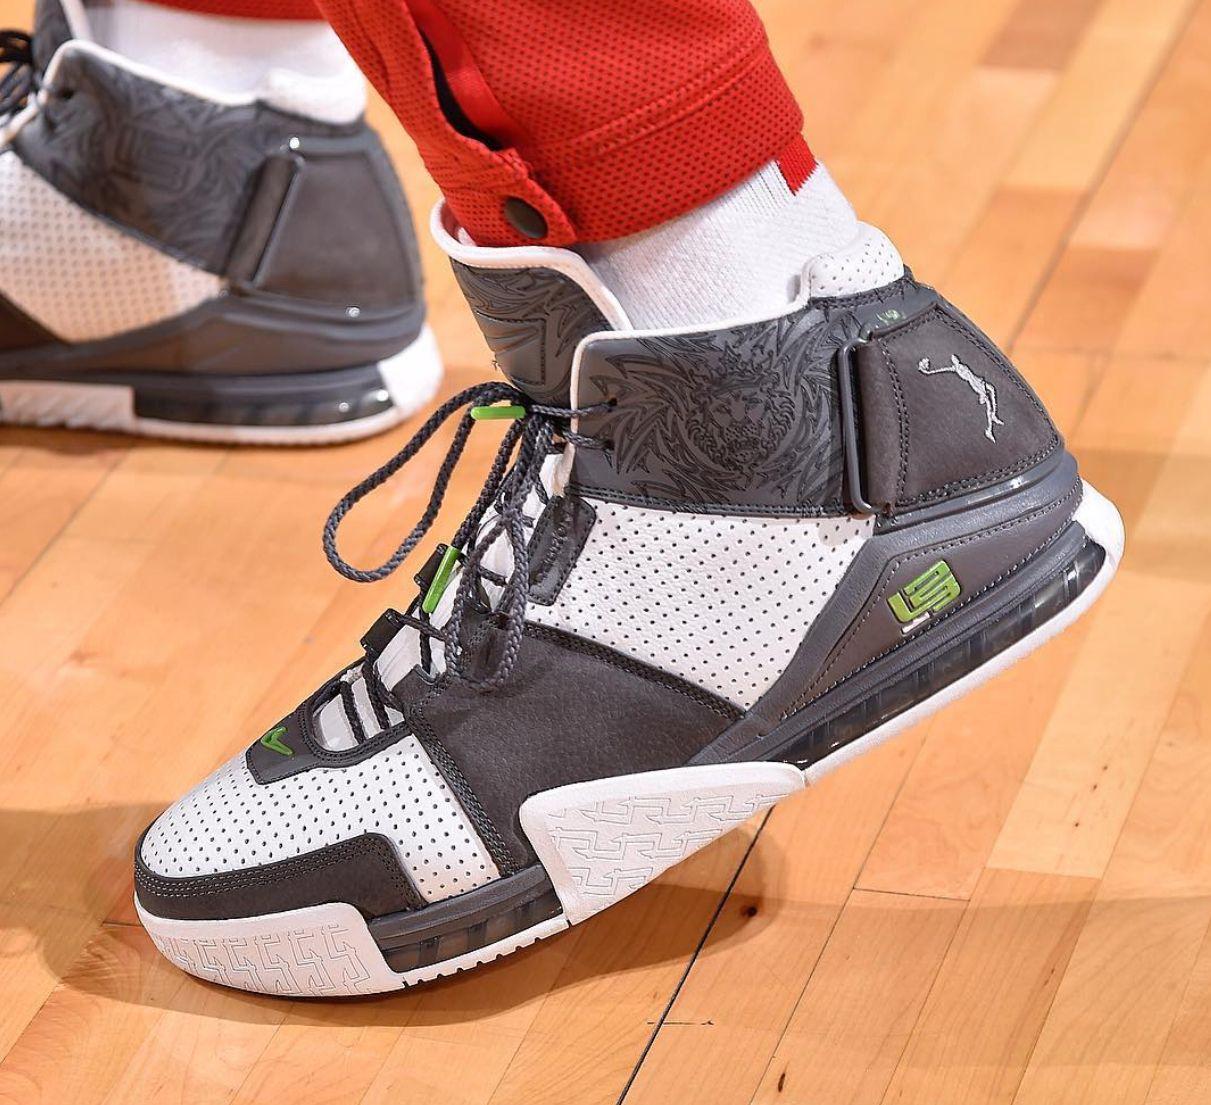 Pin by 4lb3rt0 on Scarpe da Basket | Nike air max 97 black, Nike ...